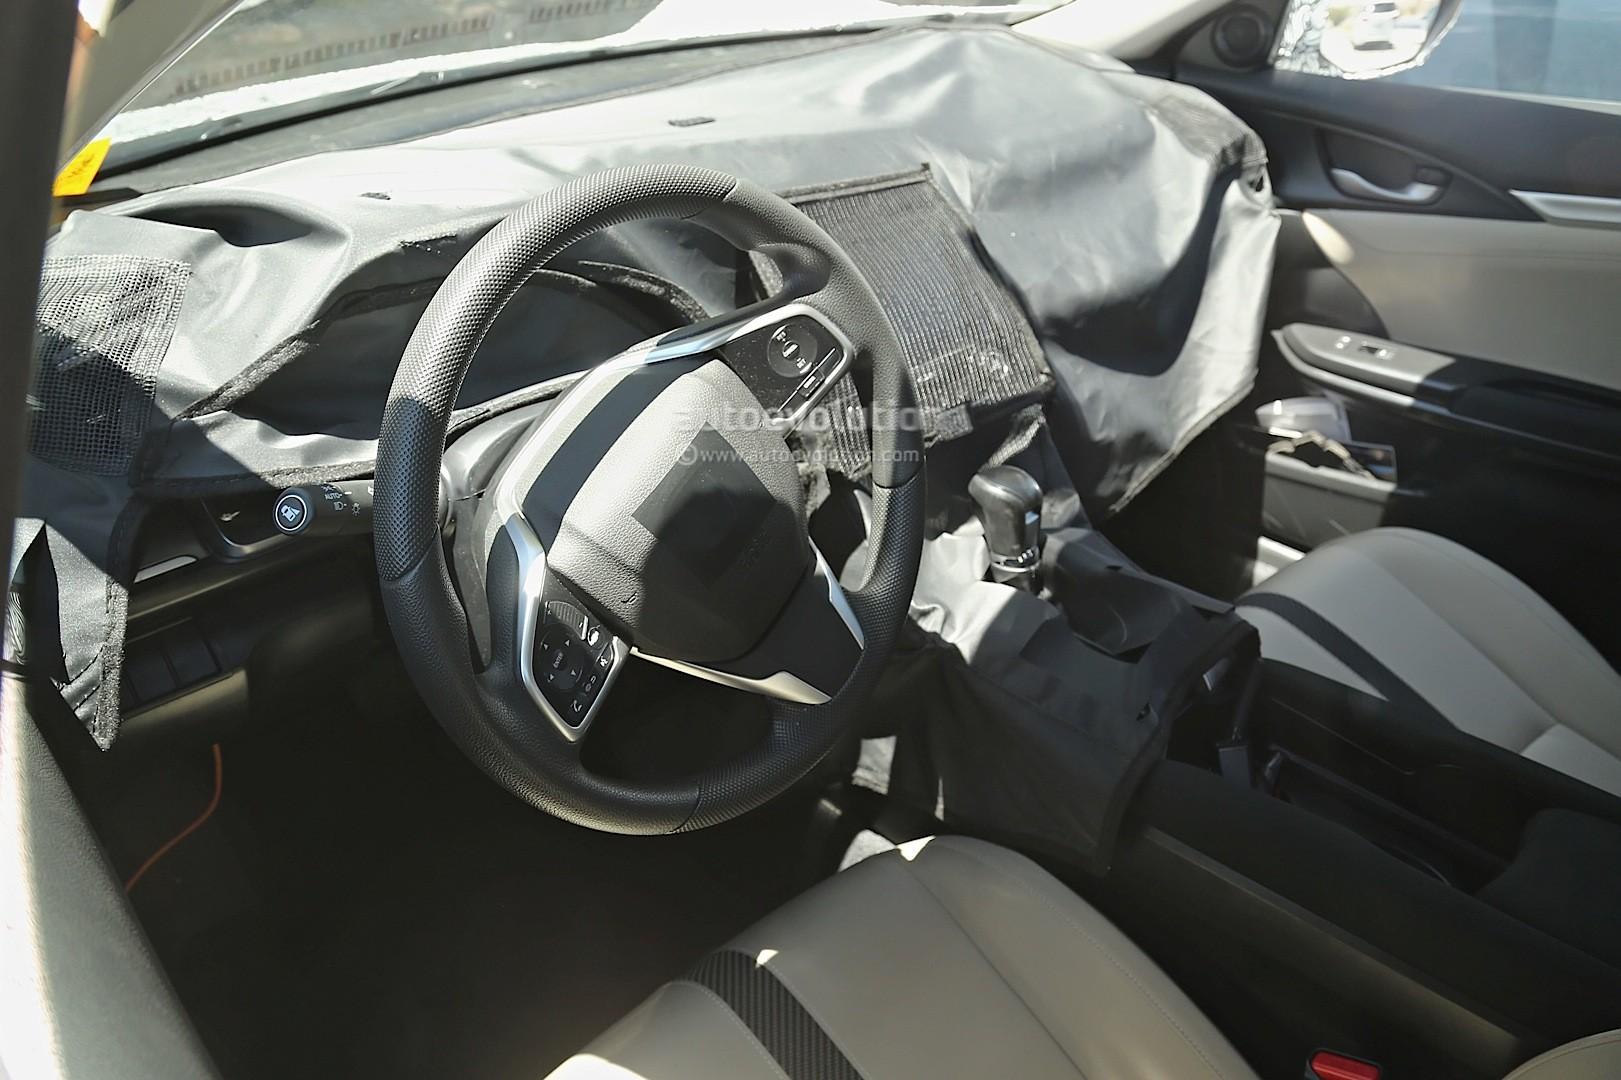 Civic Sedan Interior: Spyshots: Next-Gen 2017 Honda Civic Sedan Interior